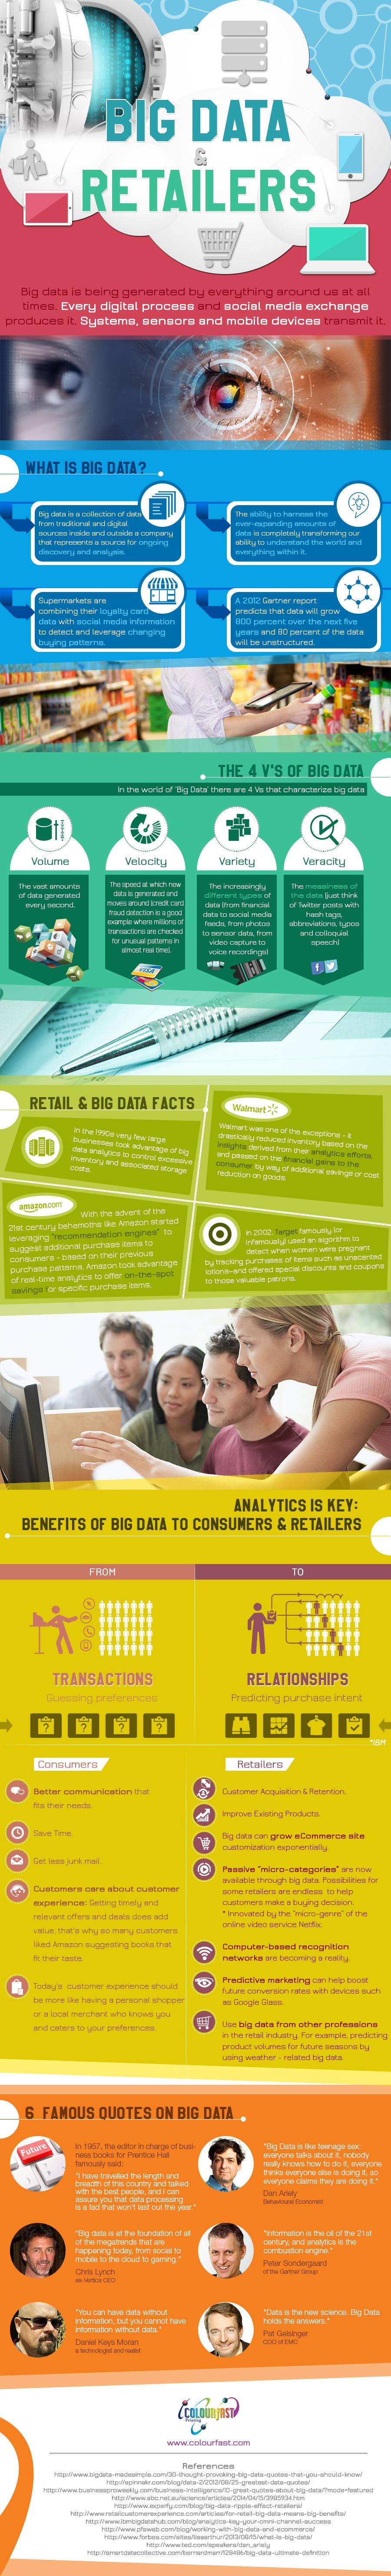 Big Data & Retailers